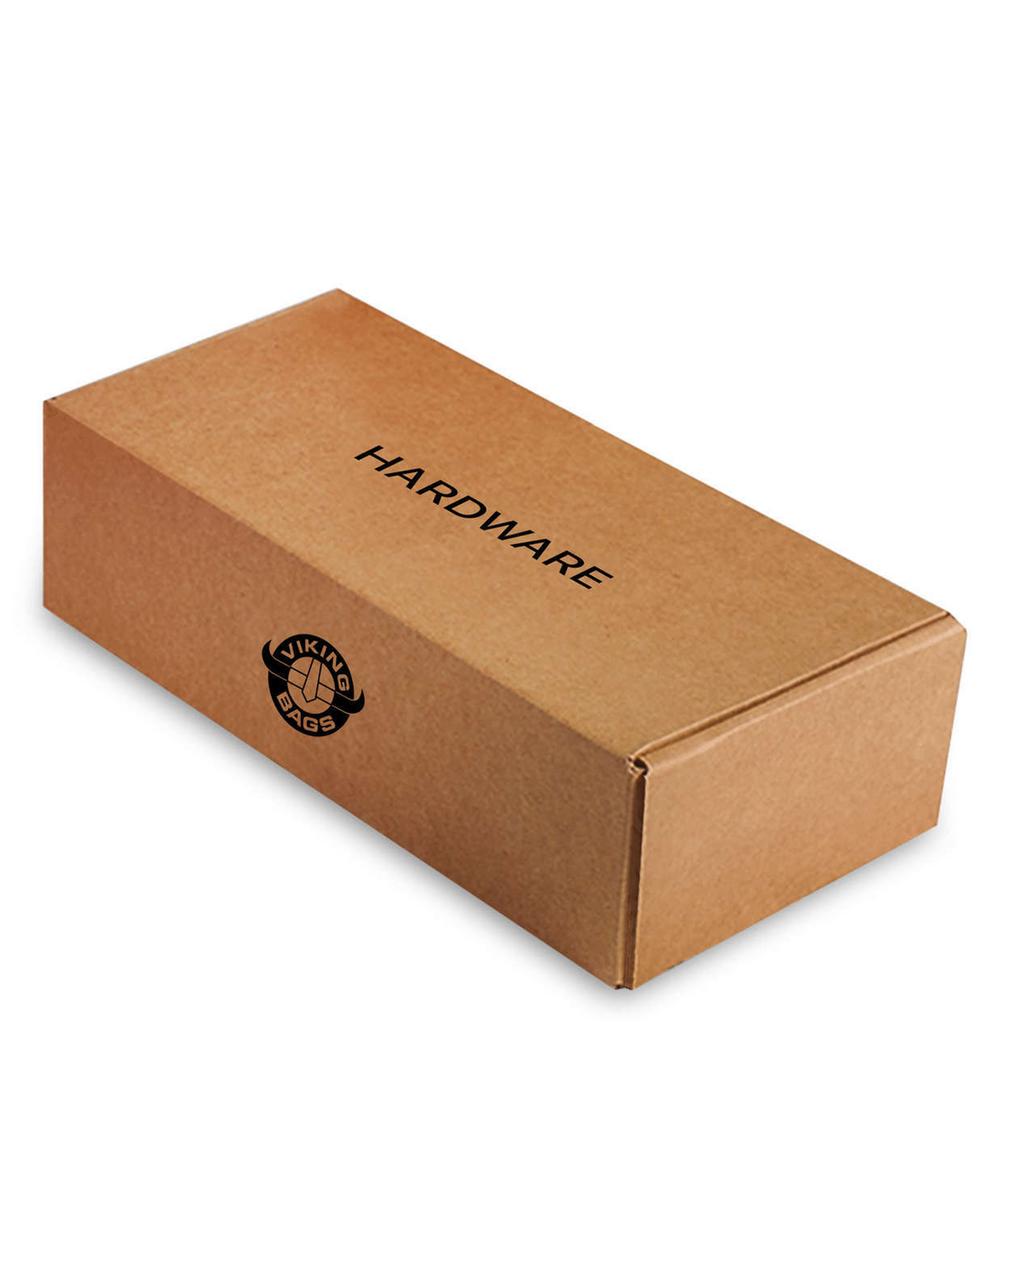 Honda VTX 1800 S Trianon Studded Leather Motorcycle Saddlebags Box